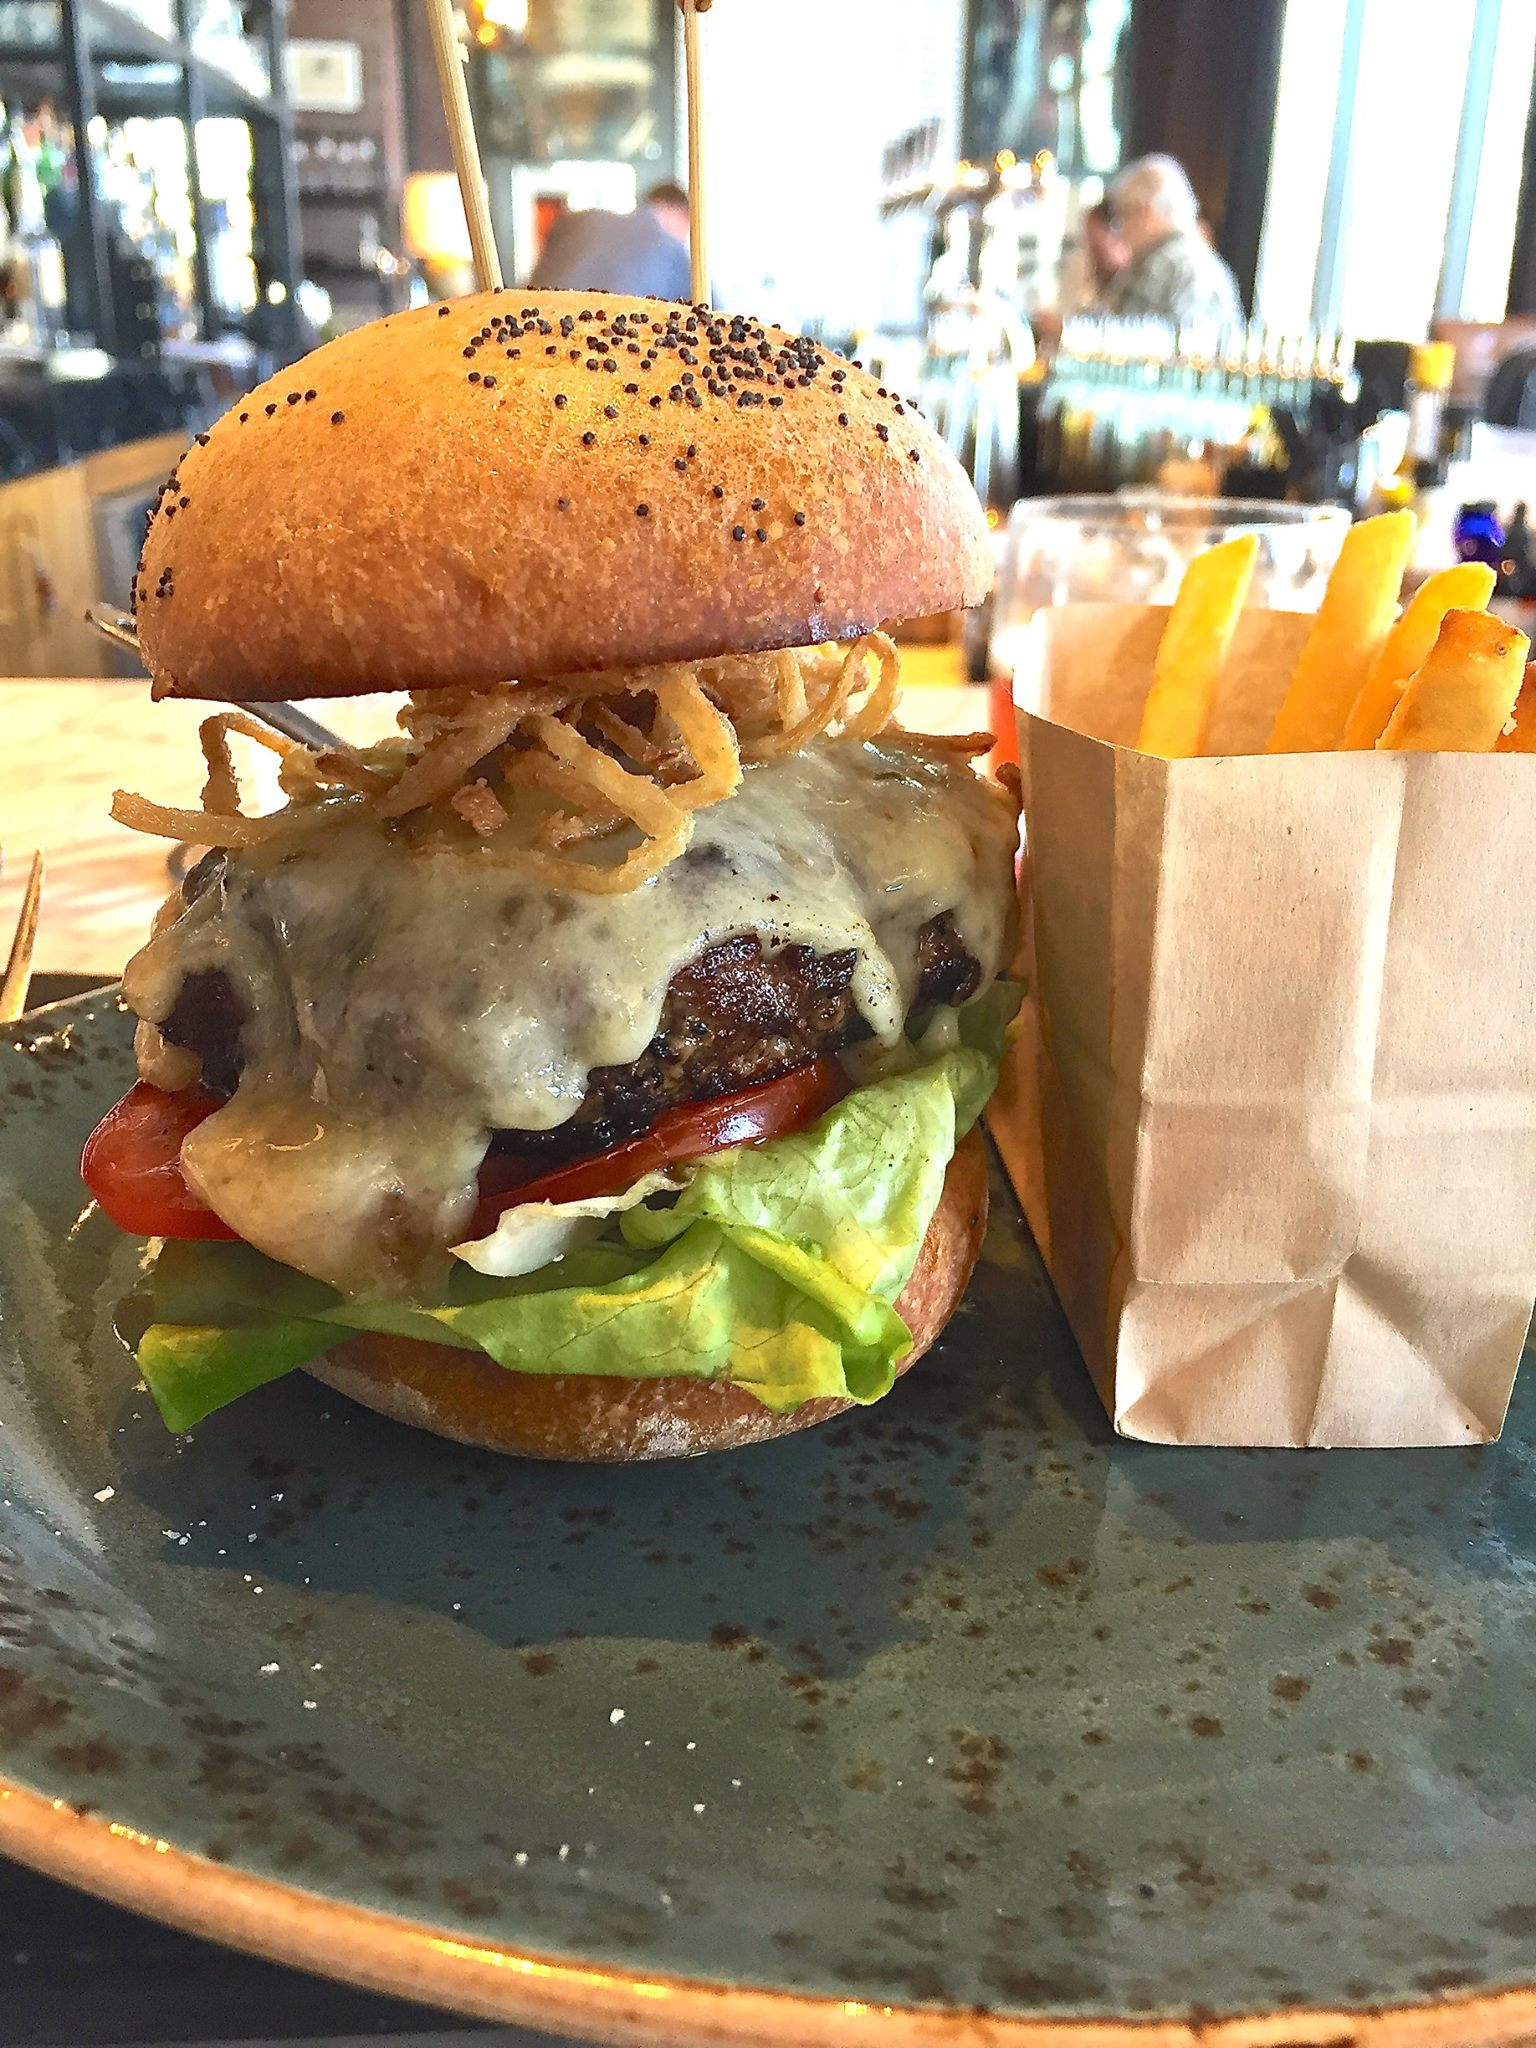 The Bancroft Burger